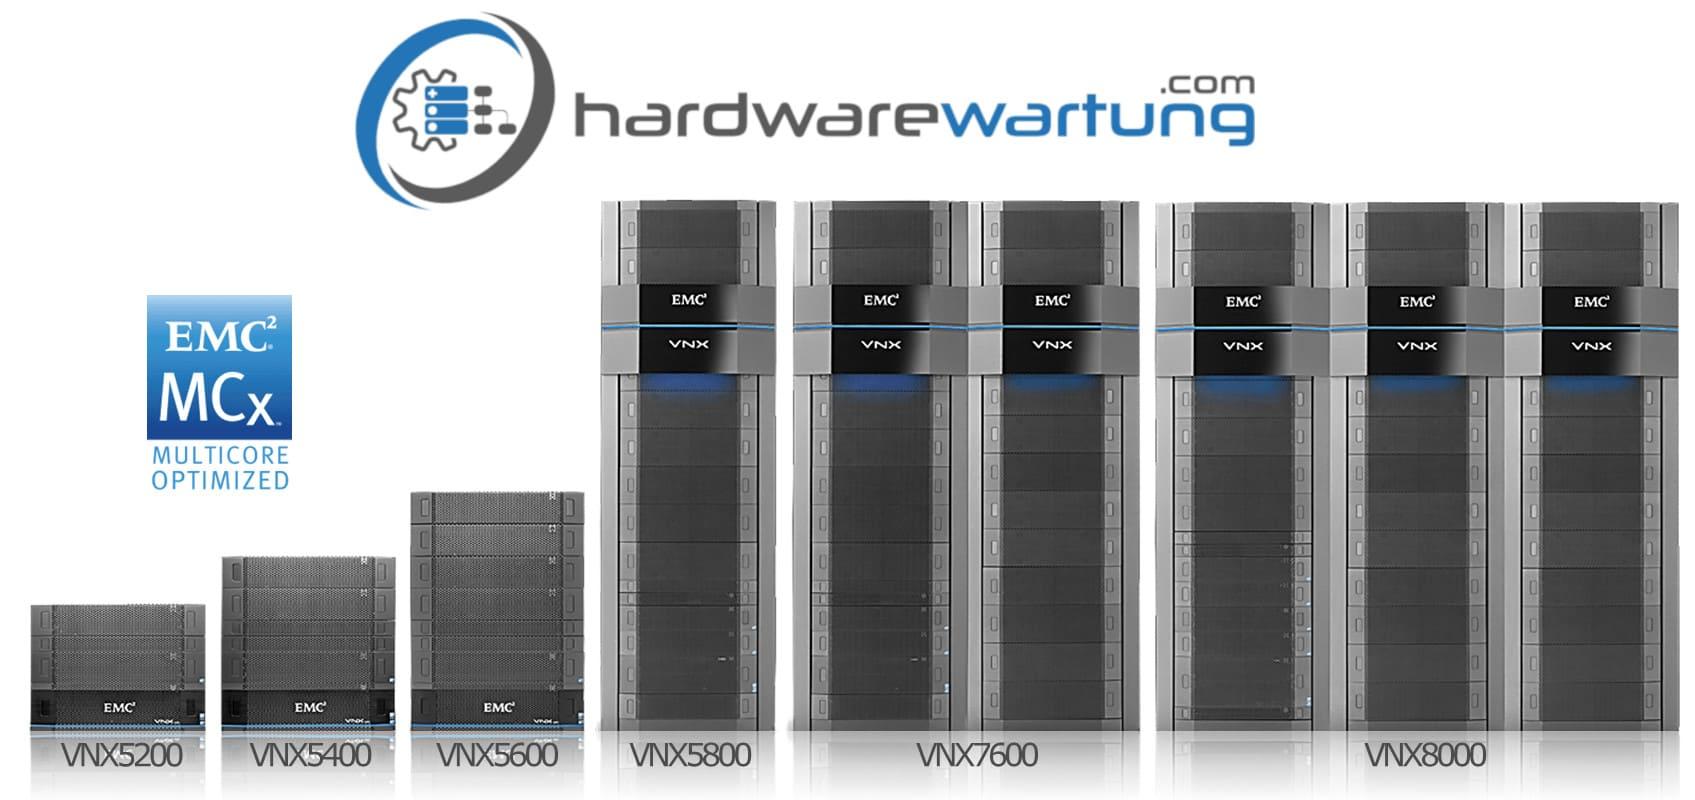 Emc End Of Life Hardware Maintenance For Emc Eol Storage